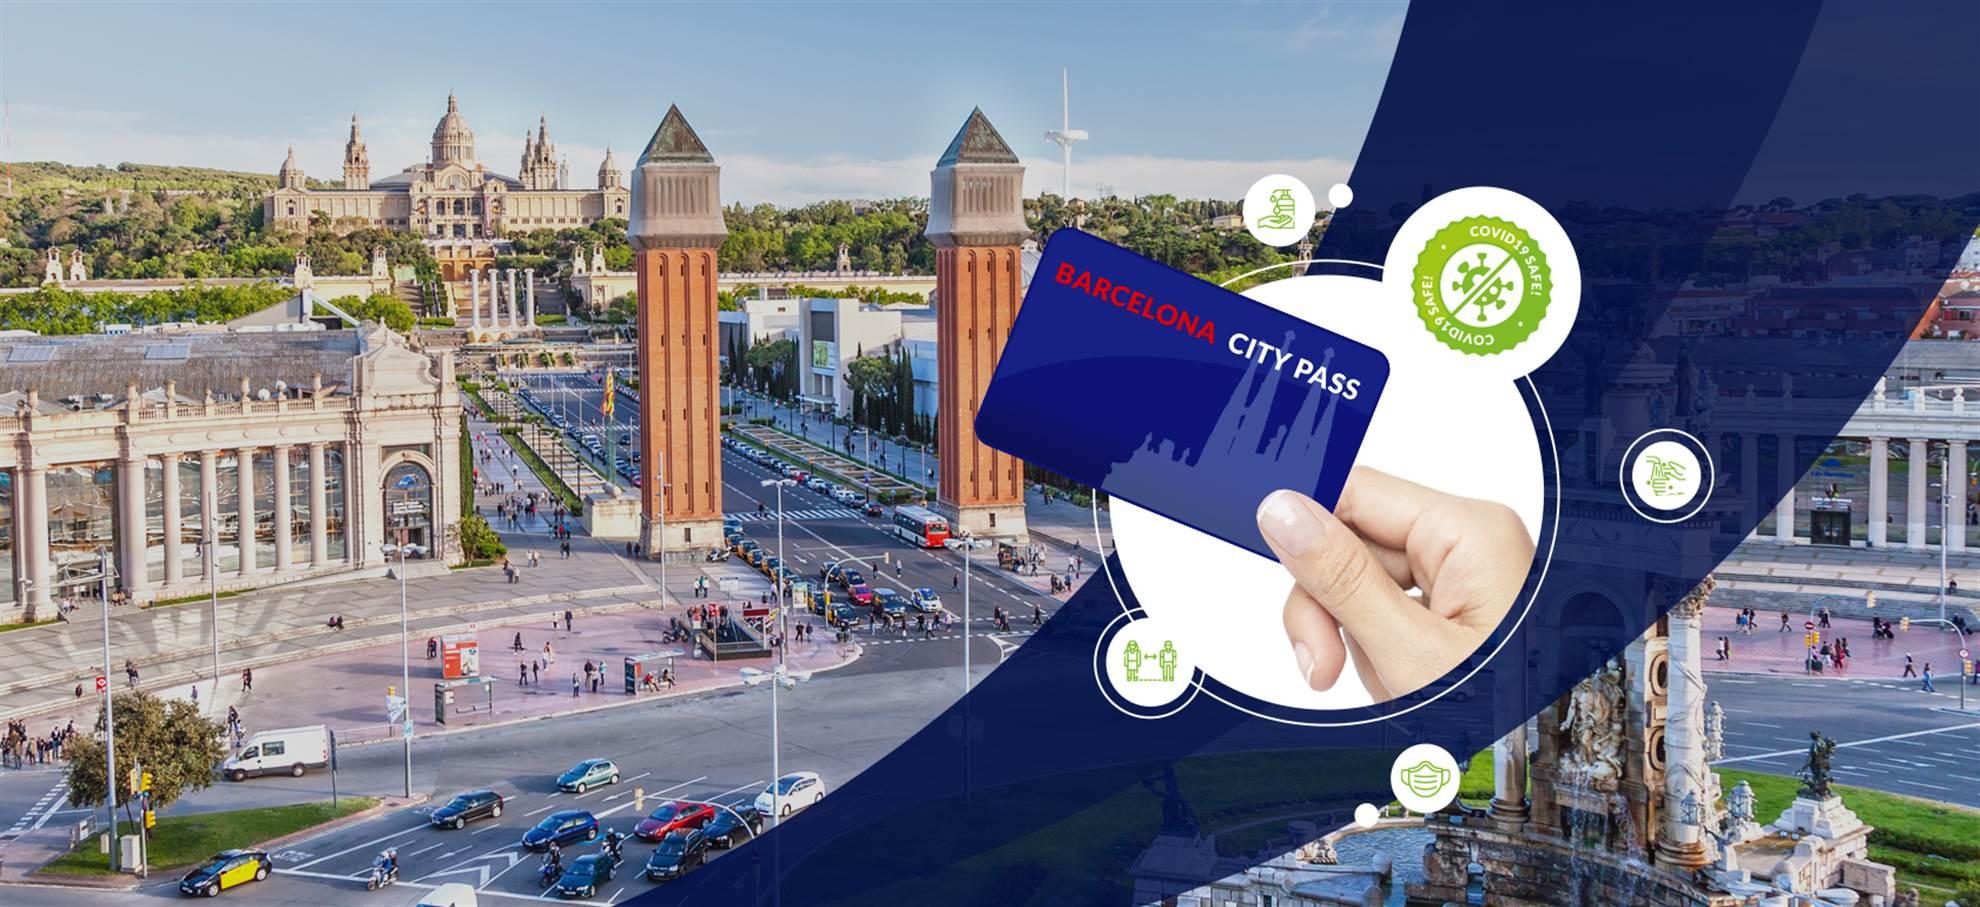 Barcelona City Pass (Corona seguro)